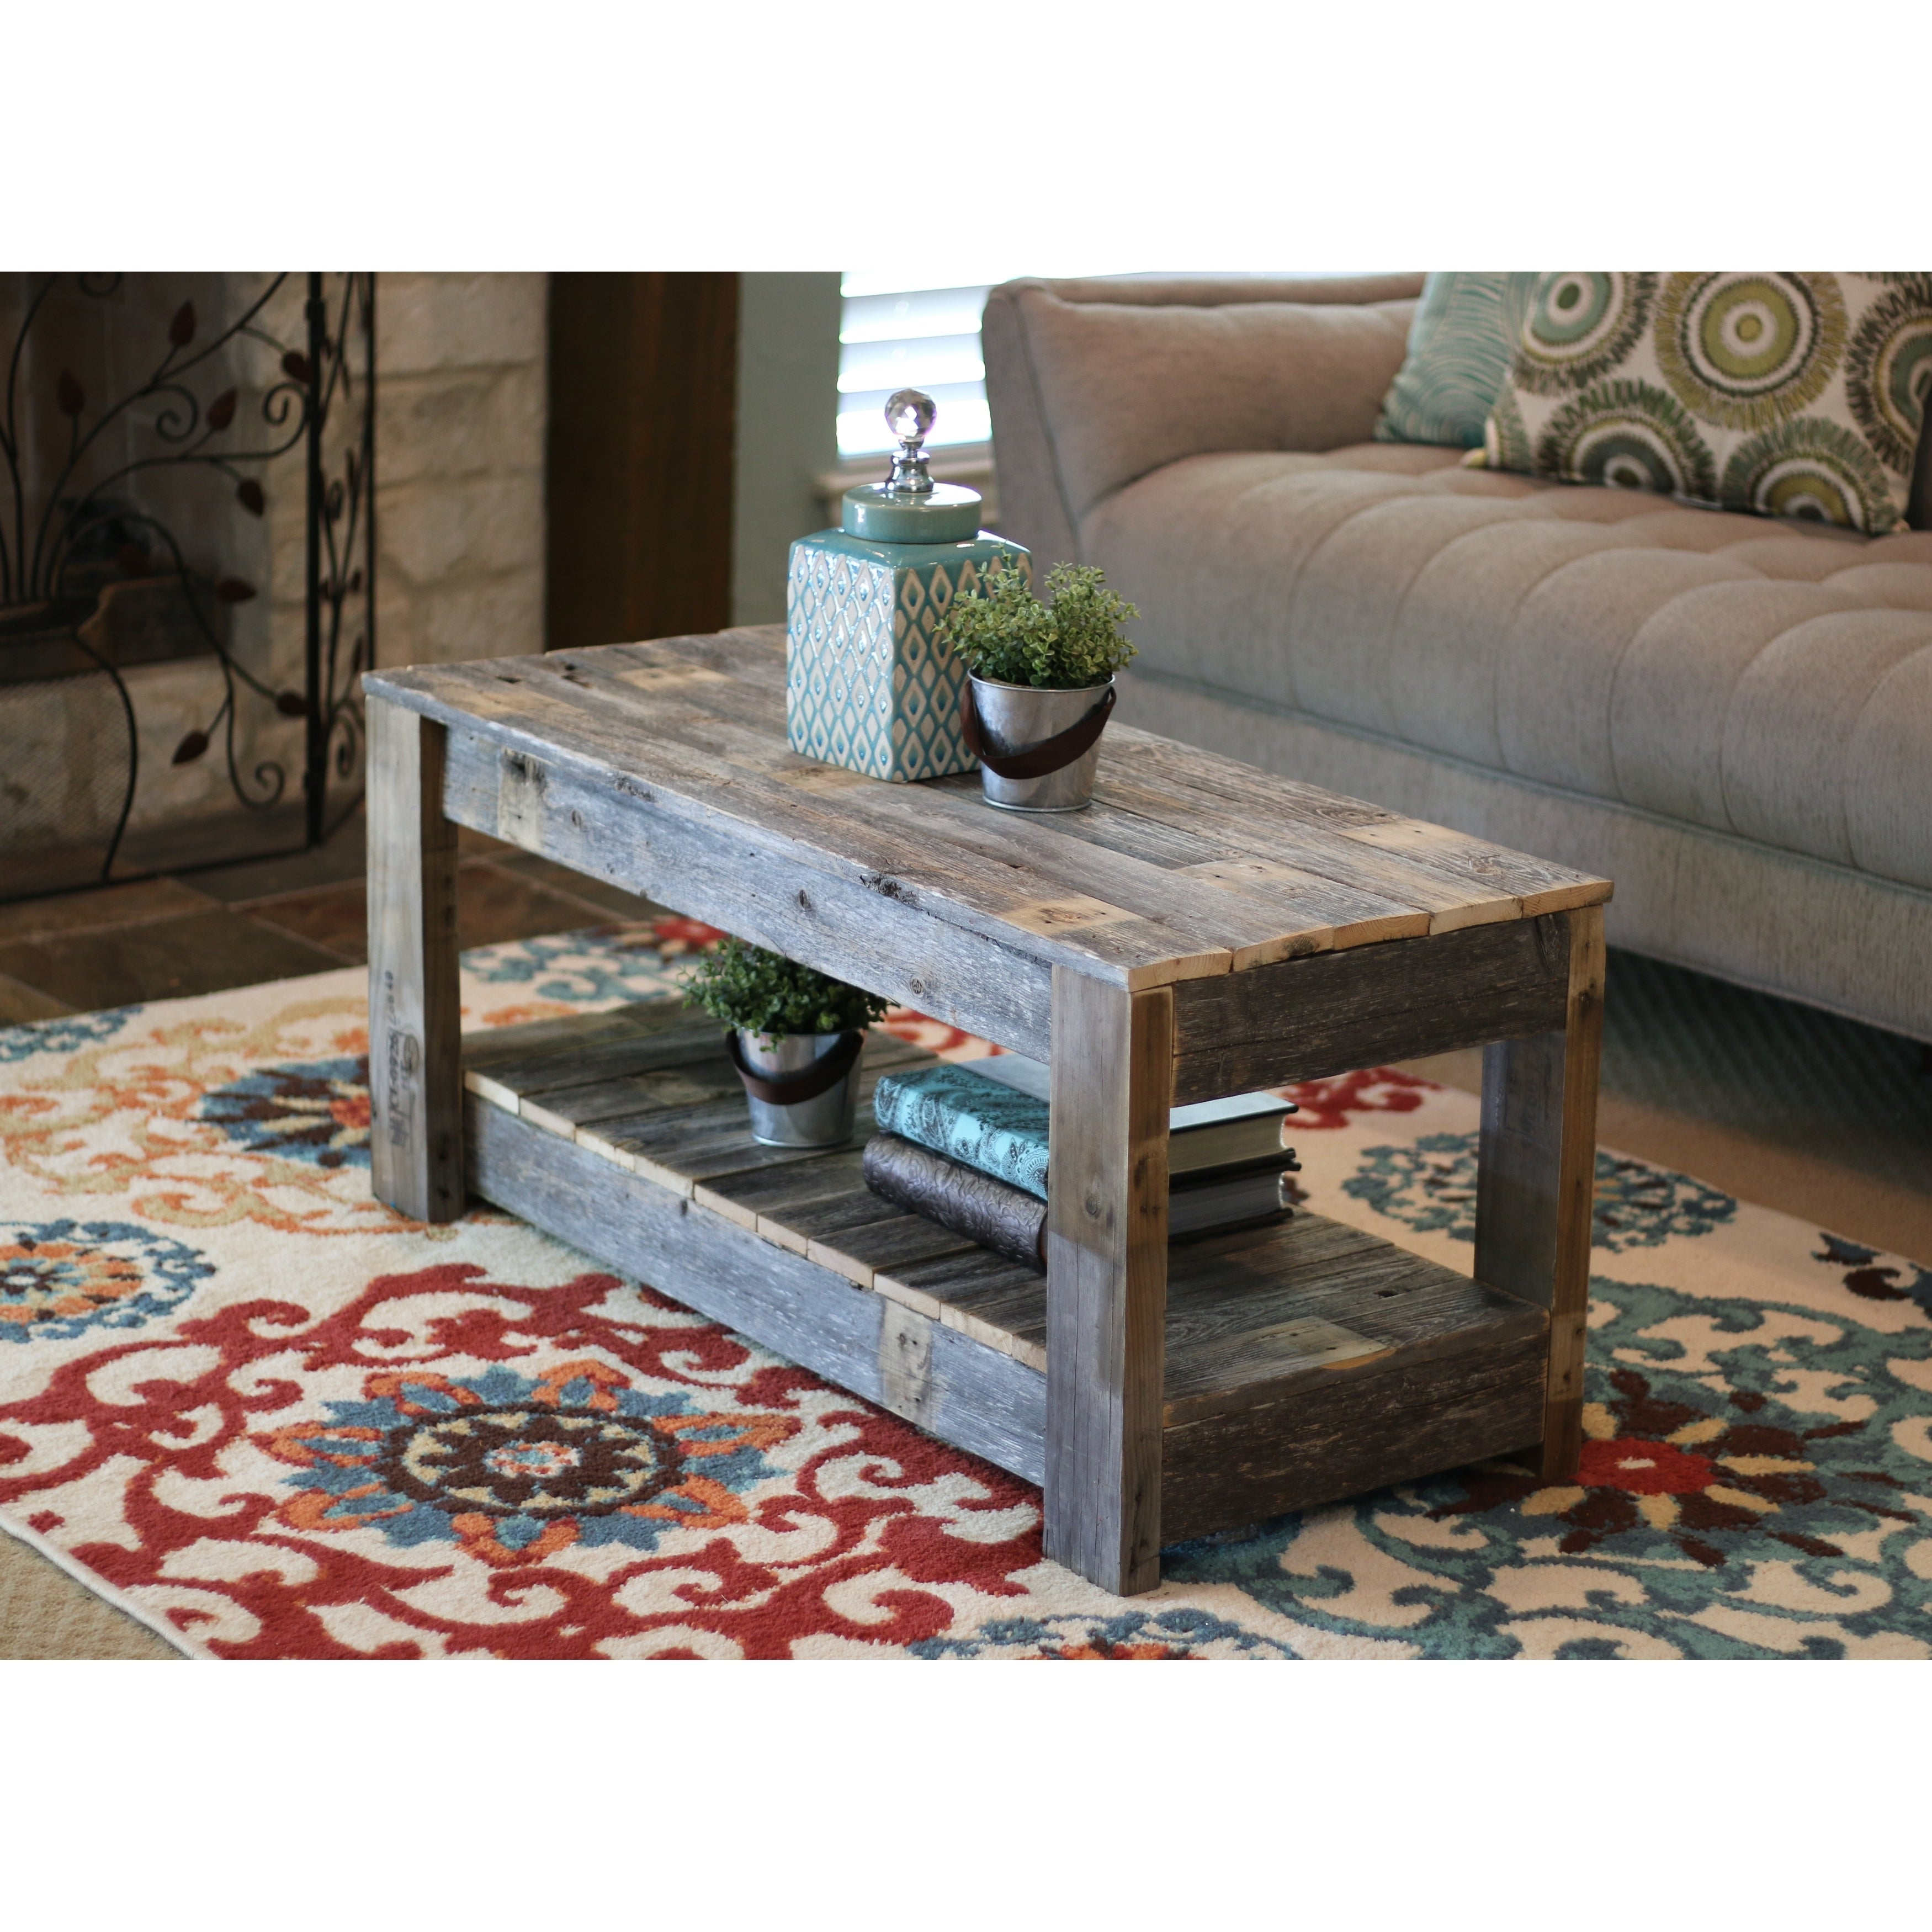 Shop Original Farmhouse Coffee Table Overstock 25602398 Brown